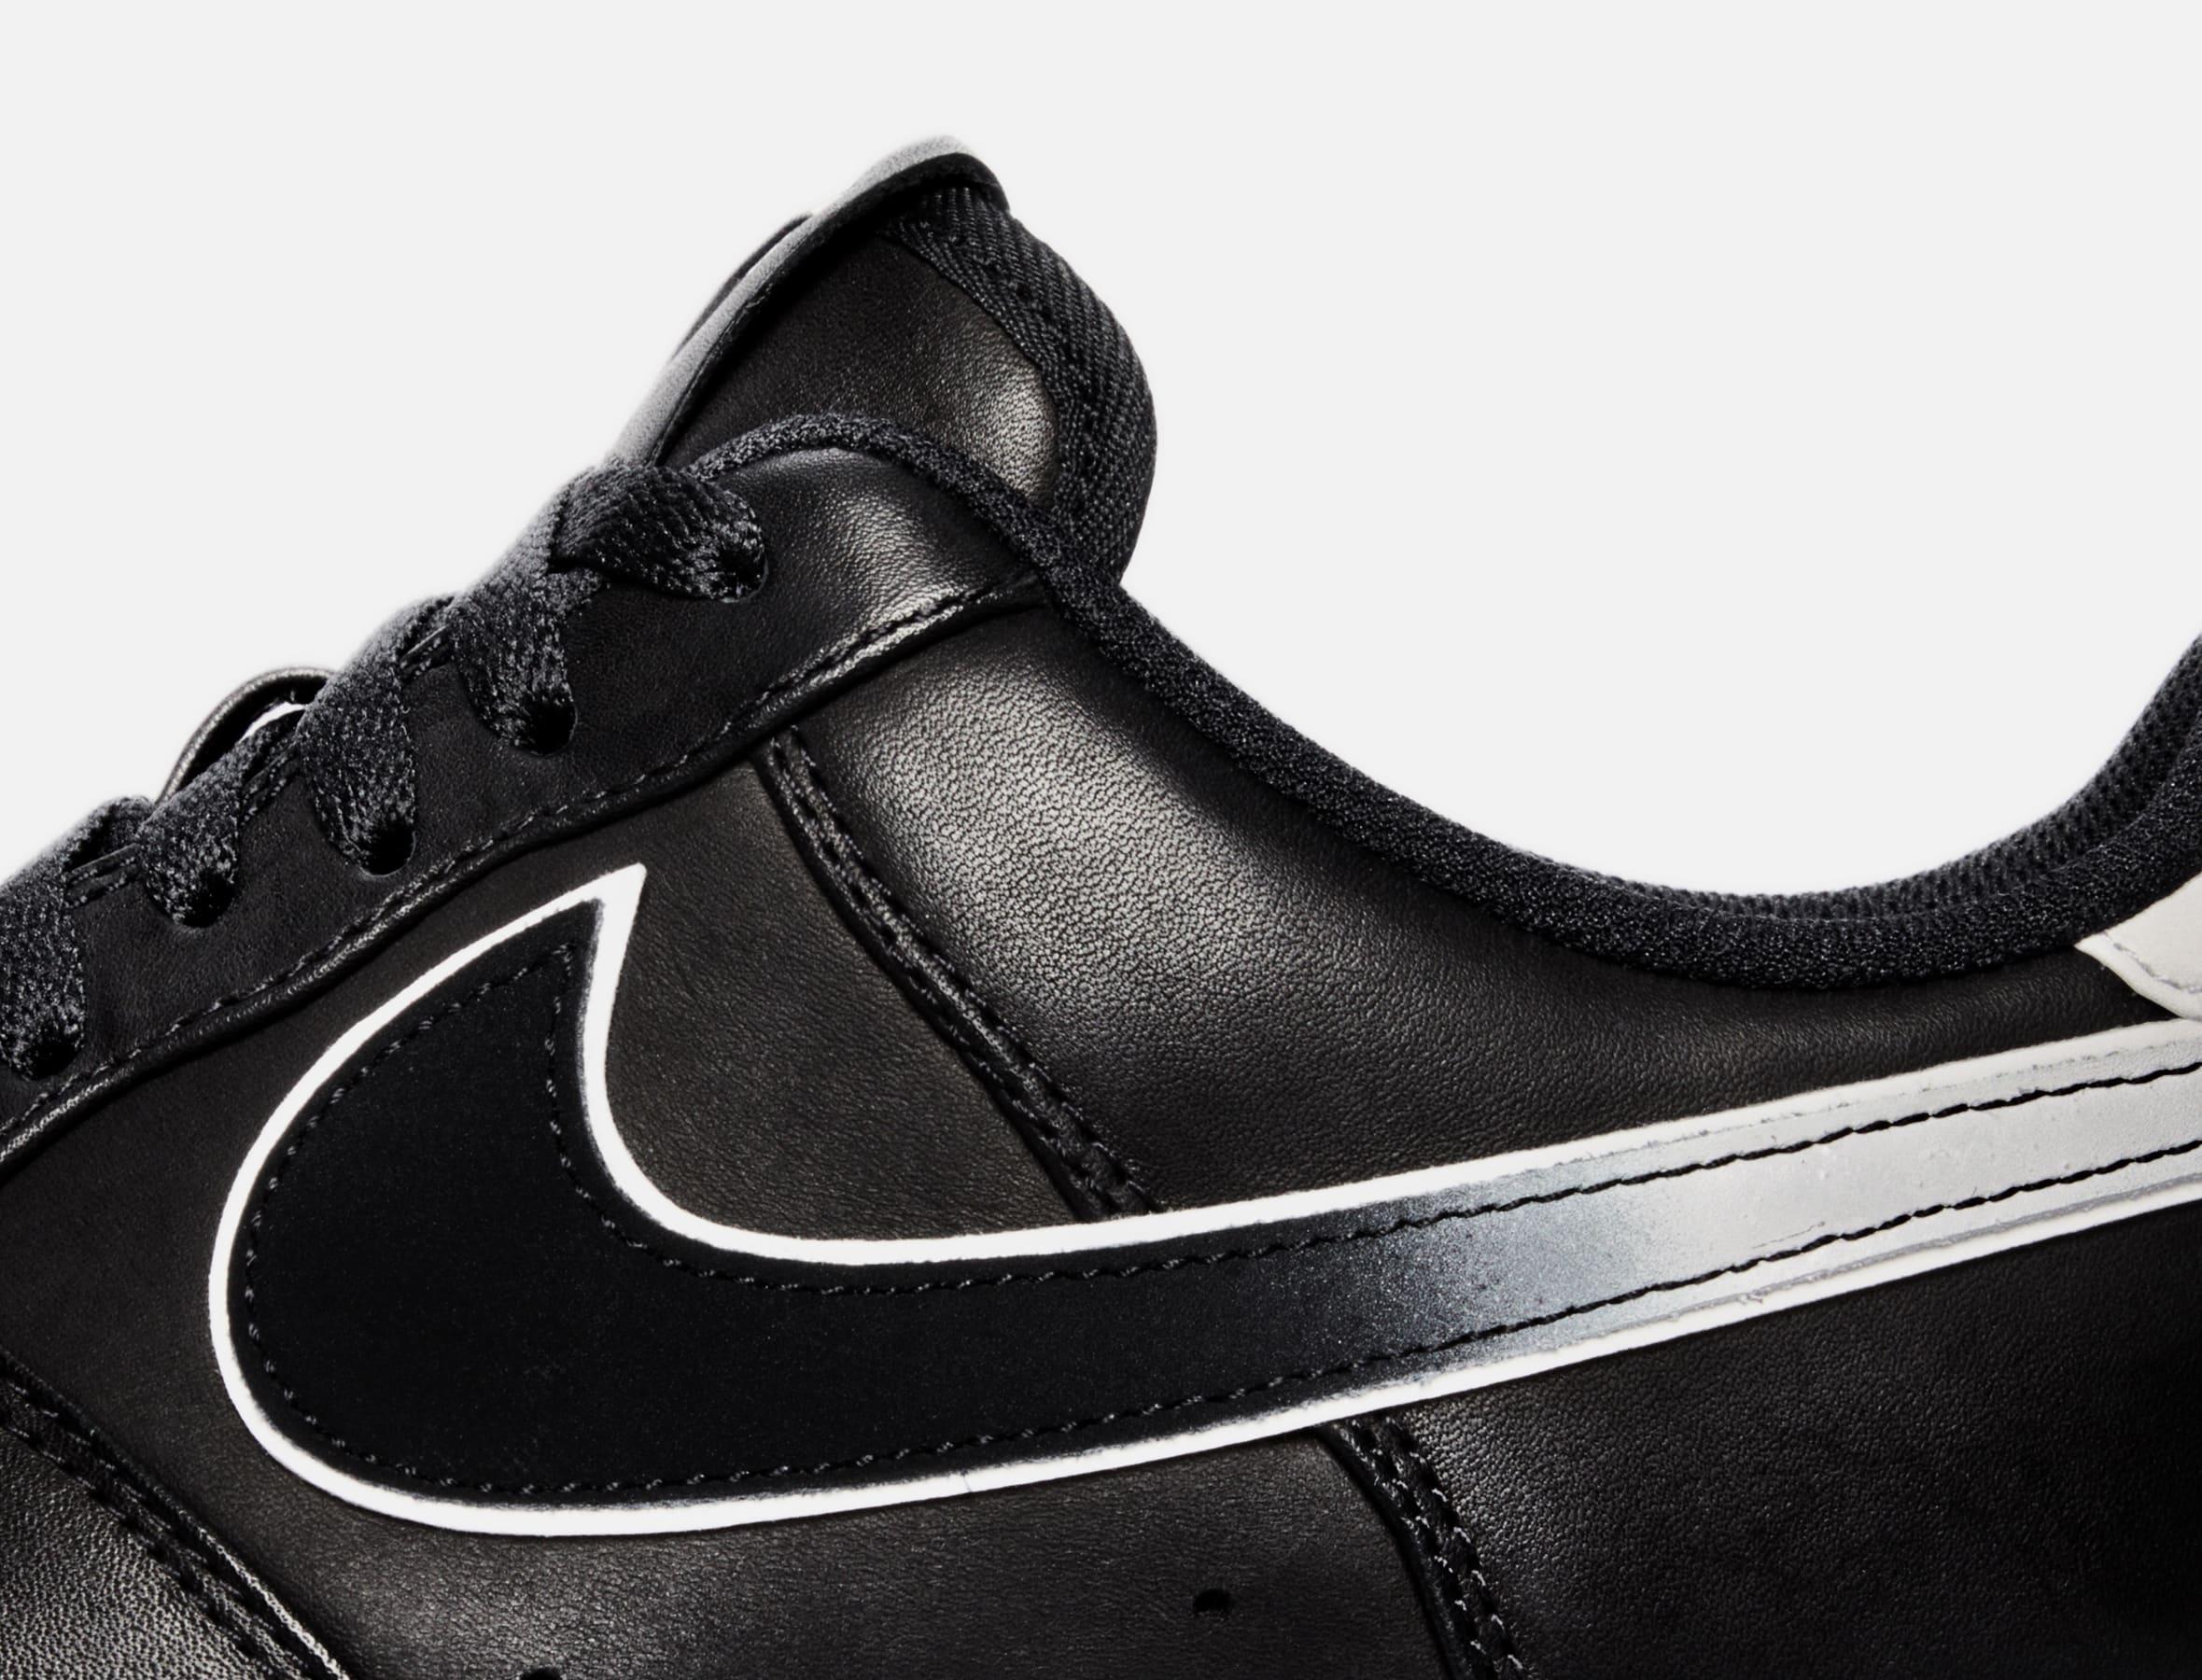 Colin Kaepernick x Nike Air Force Low Release Date CQ0493-001 Swoosh